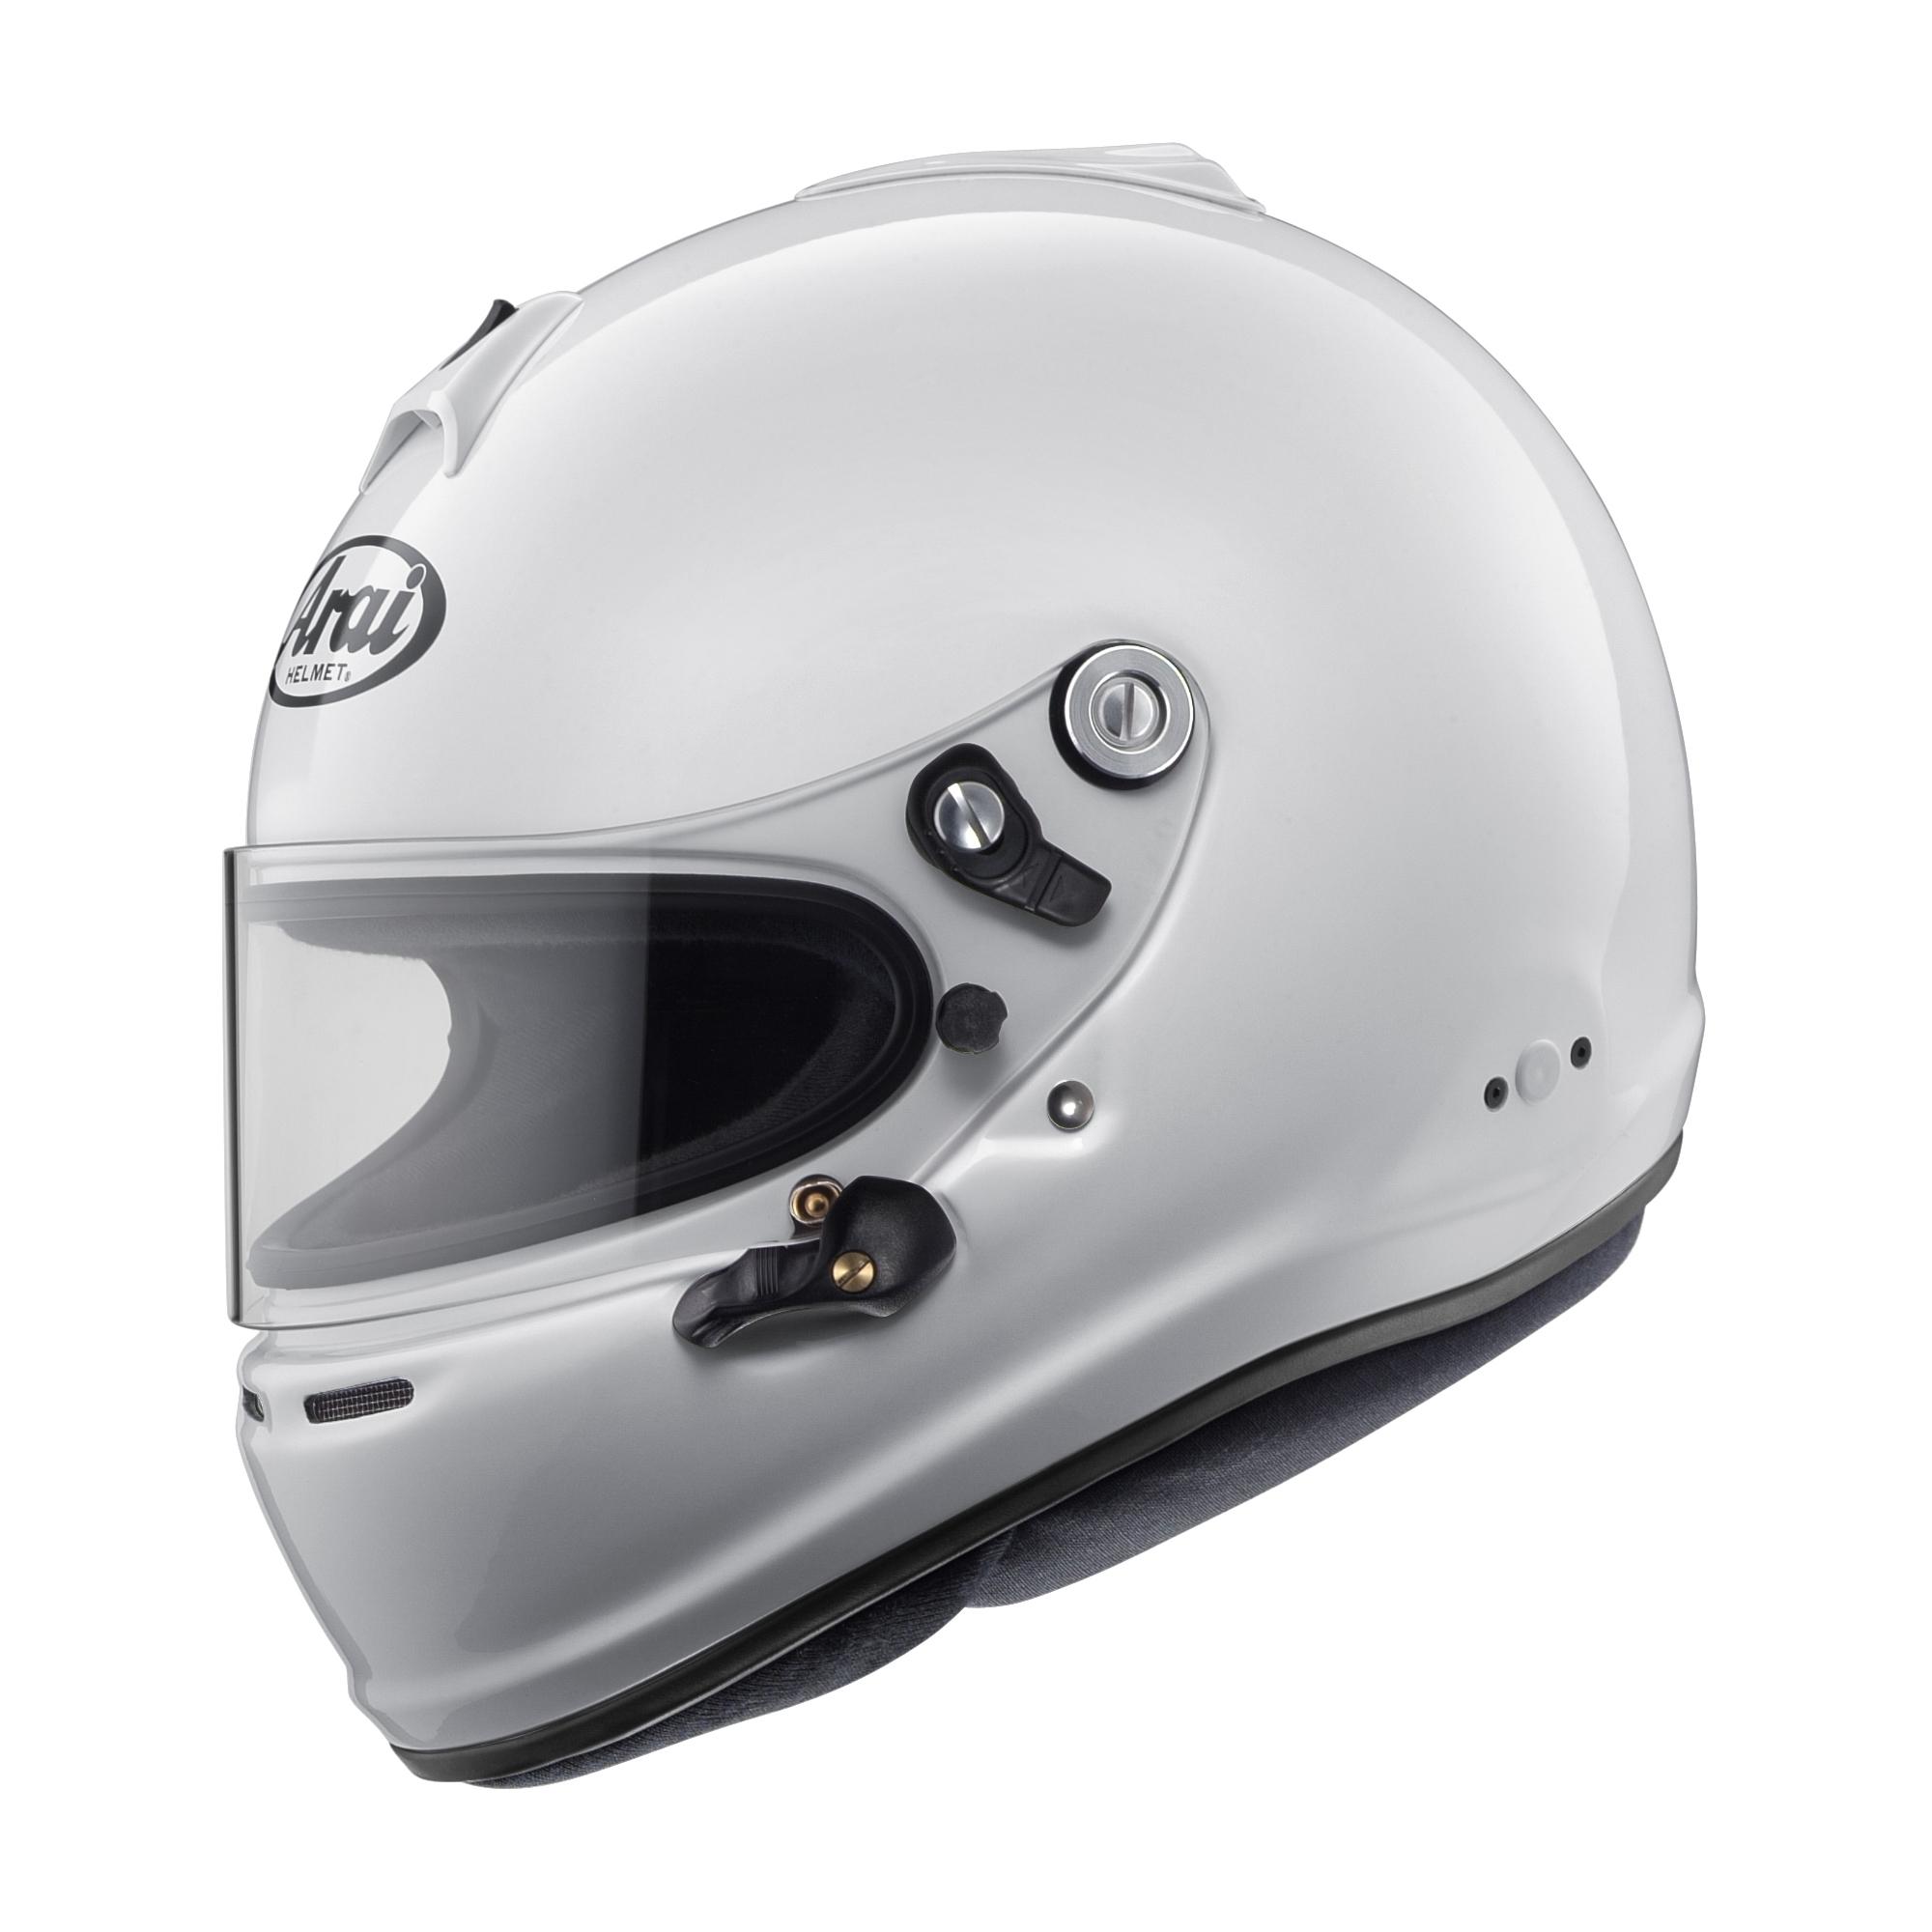 Arai Helmet 685311143457 Helmet, GP-6S, Snell SA2015, FIA Approved, Head and Neck Support Ready, White, Medium, Each